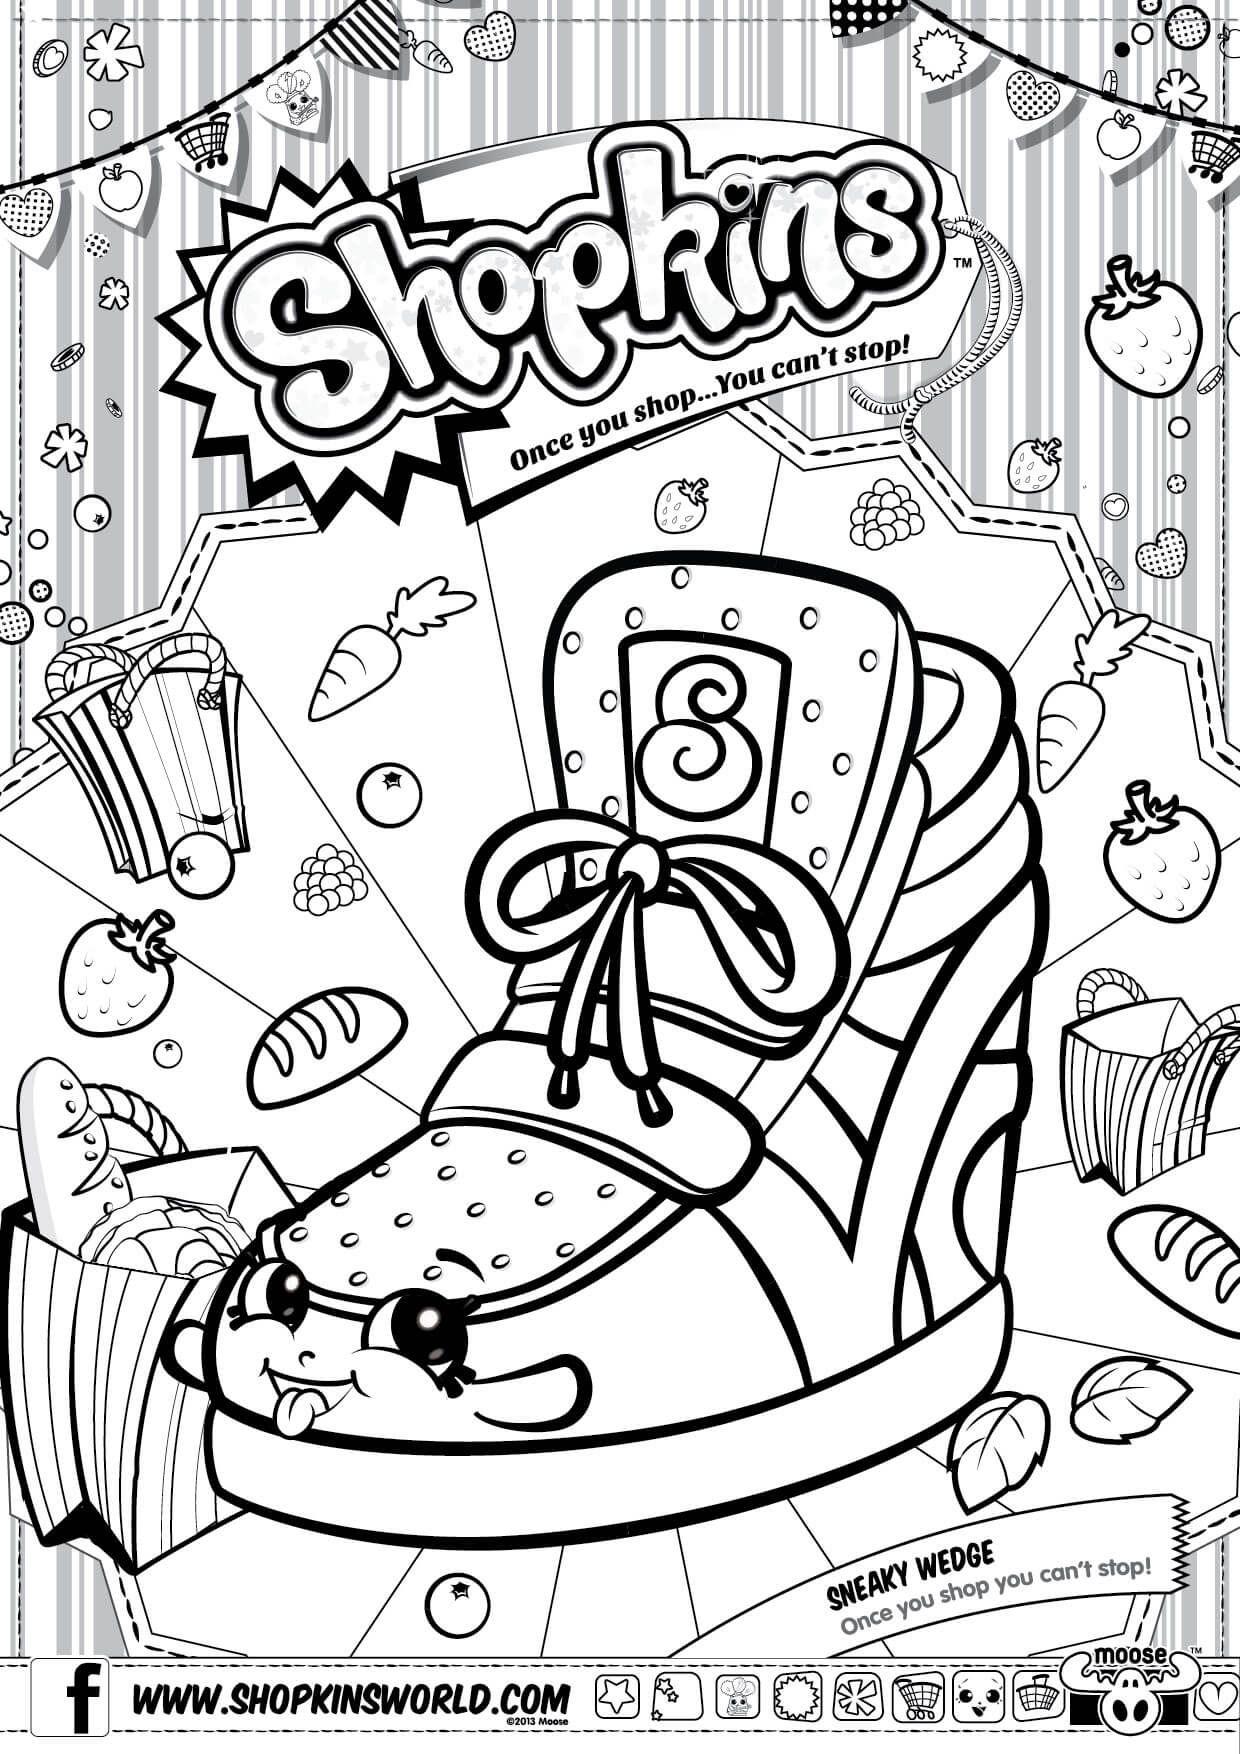 Shopkins Printable Shopkins Colouring Pages Shopkin Coloring Pages Coloring Books